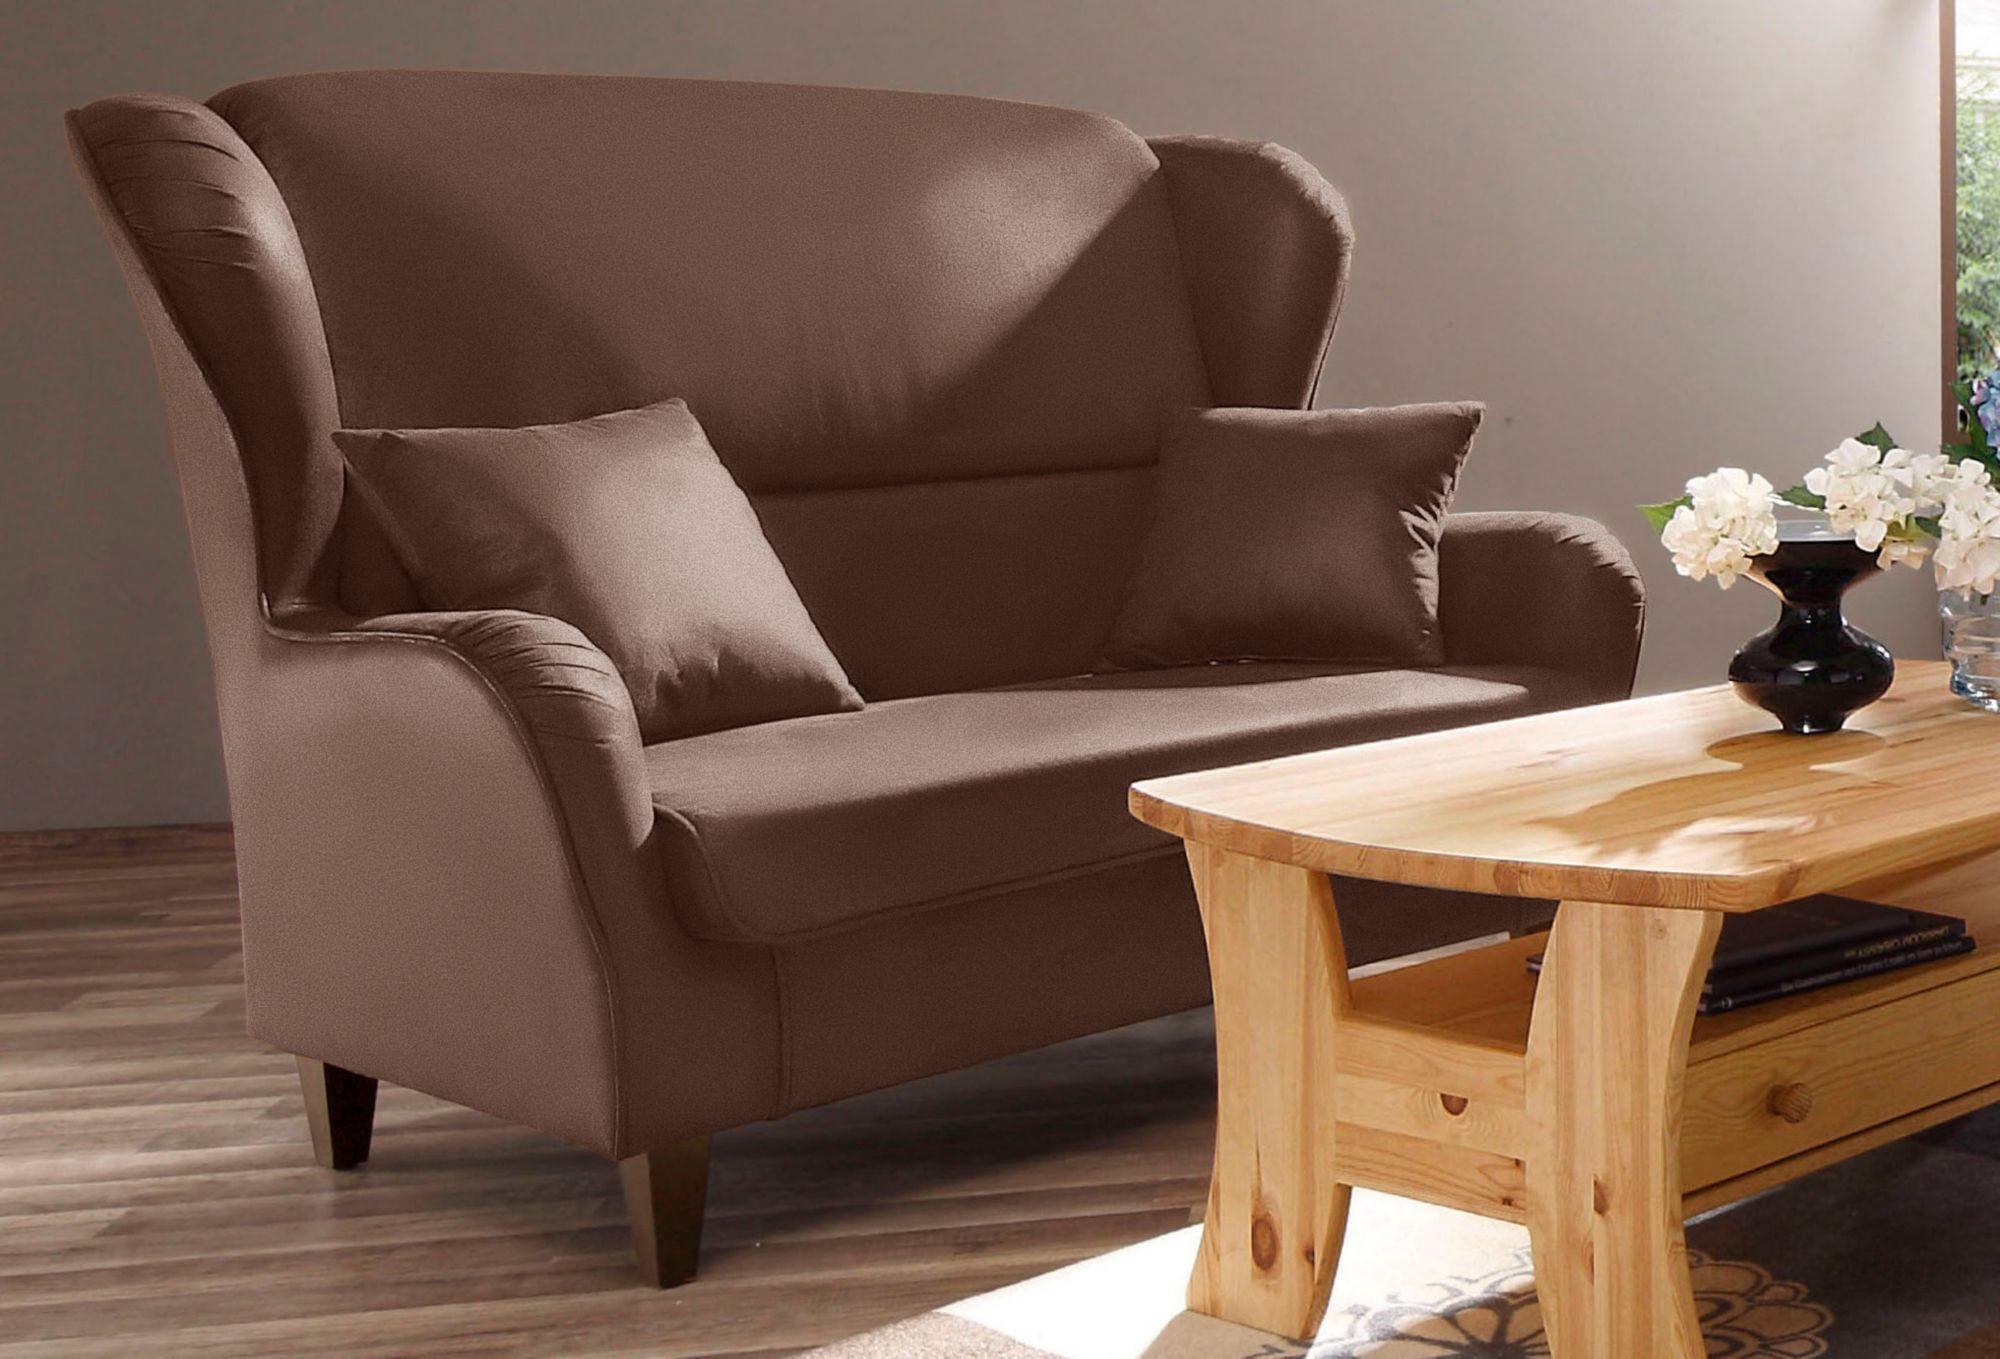 home affaire sofa nicola 2 sitzig schwab versand m bel. Black Bedroom Furniture Sets. Home Design Ideas